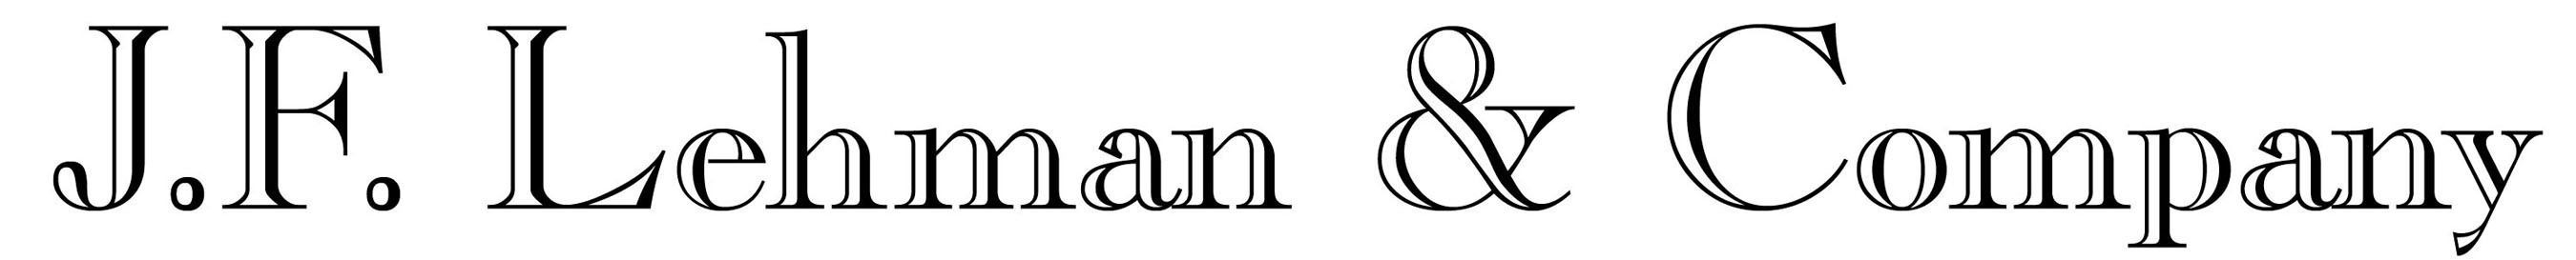 J.F. Lehman & Company logo. (PRNewsFoto/J.F. Lehman & Company)